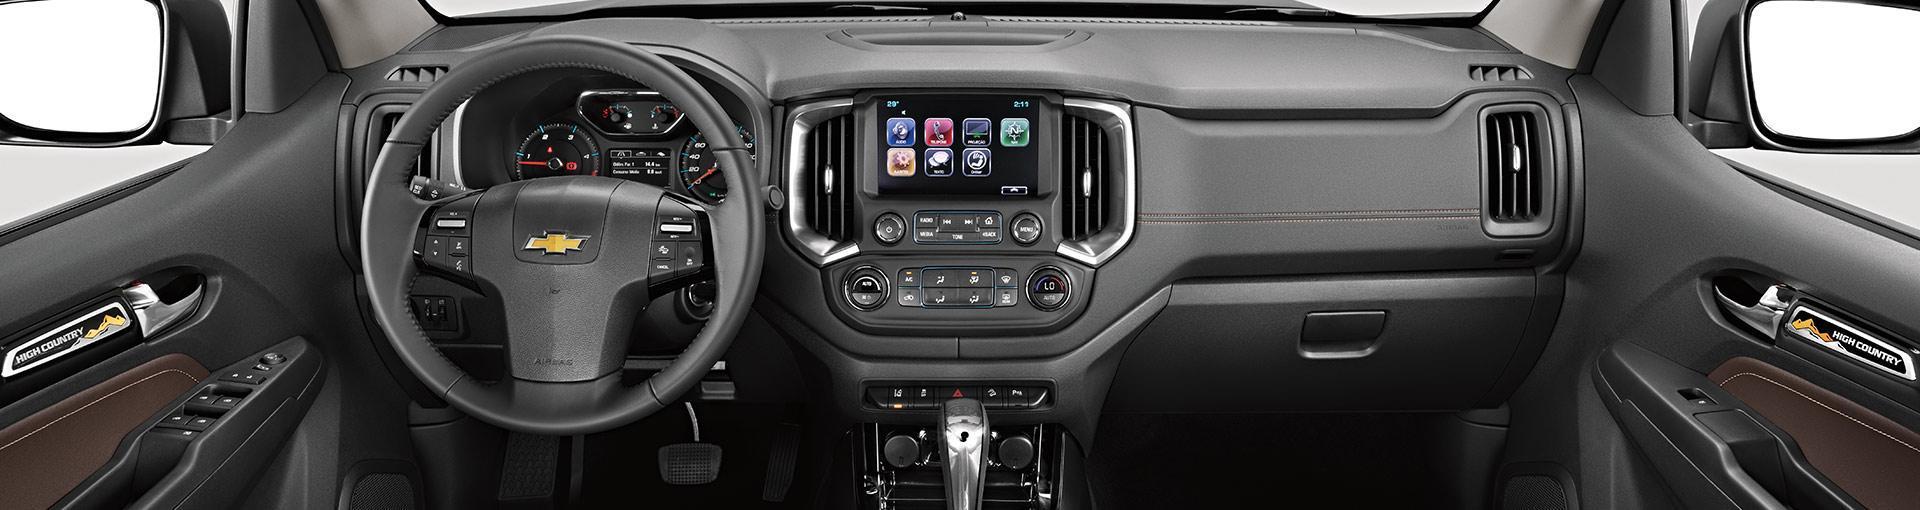 Chevrolet S10 CPA